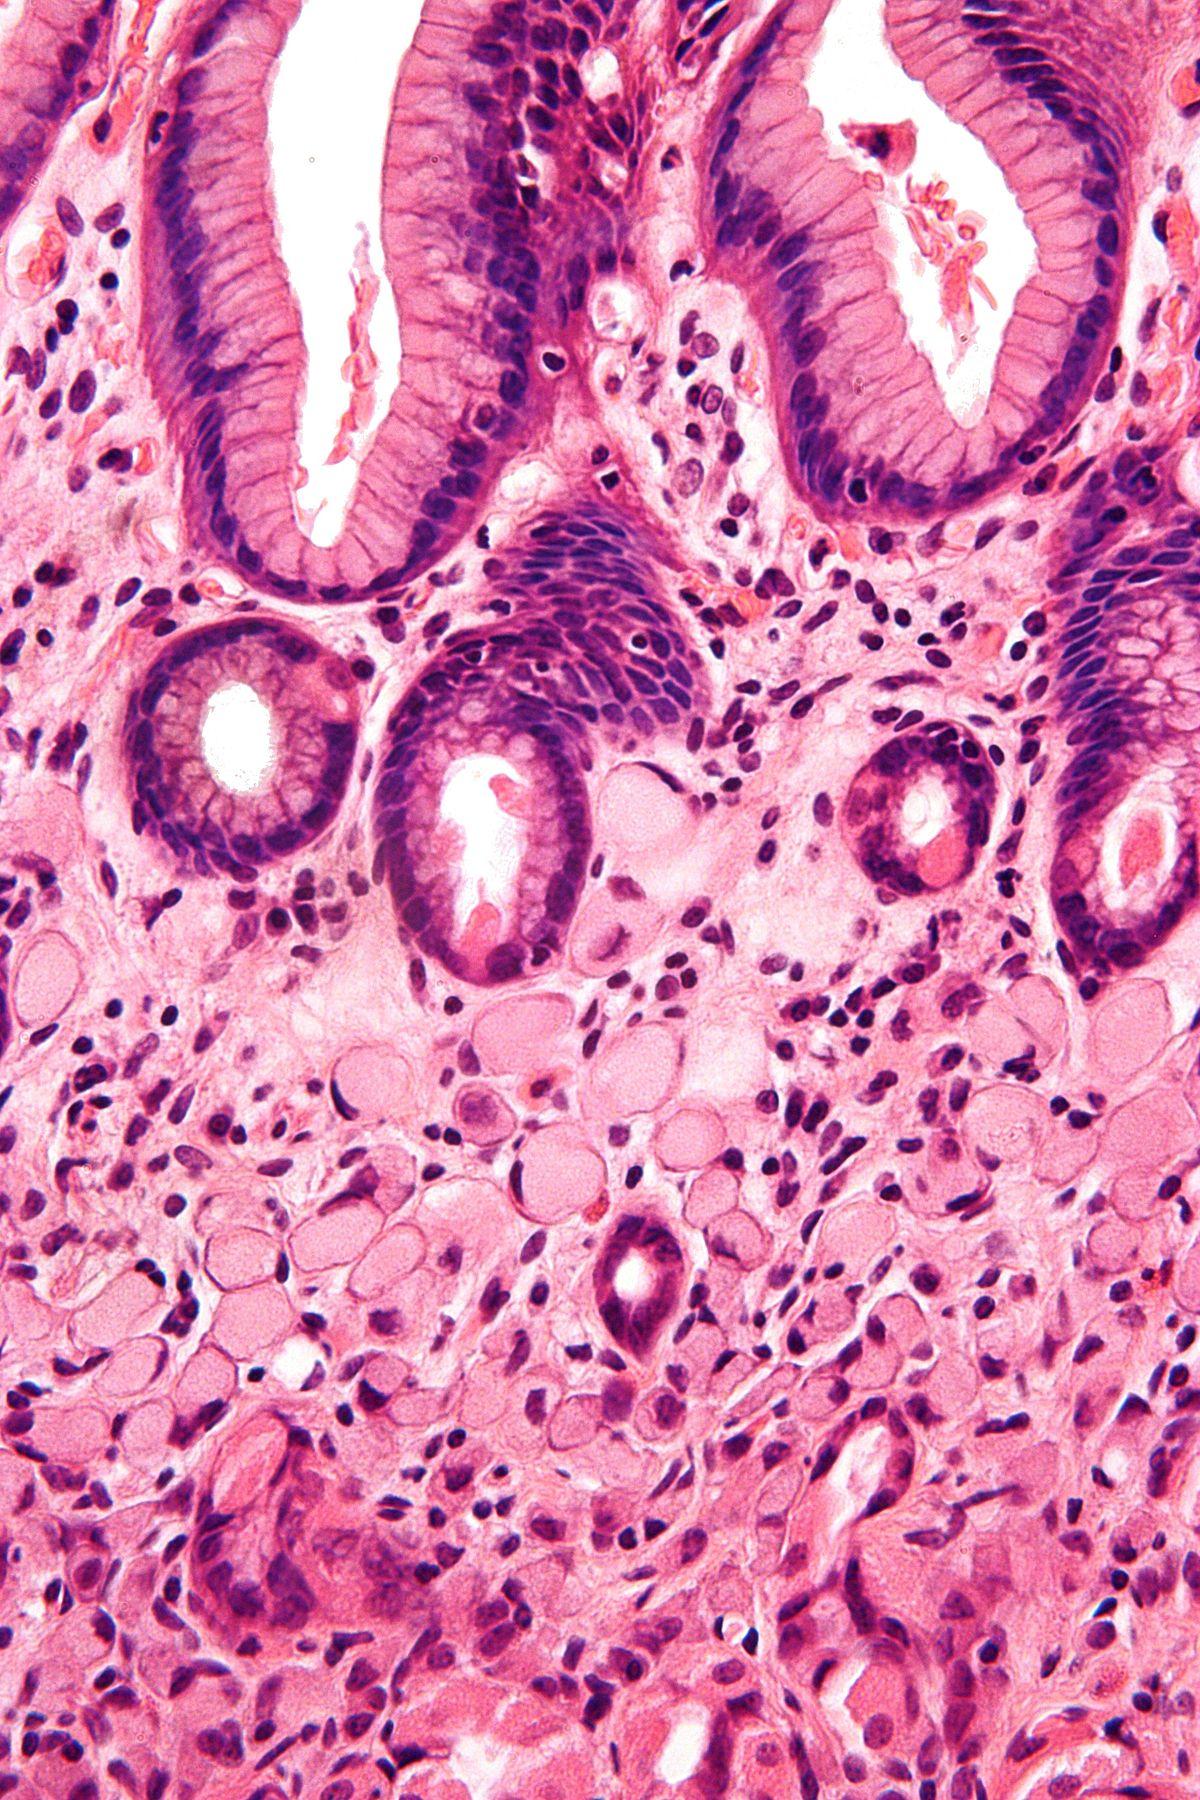 abdominal cancer cells cancerul ovarian epitelial